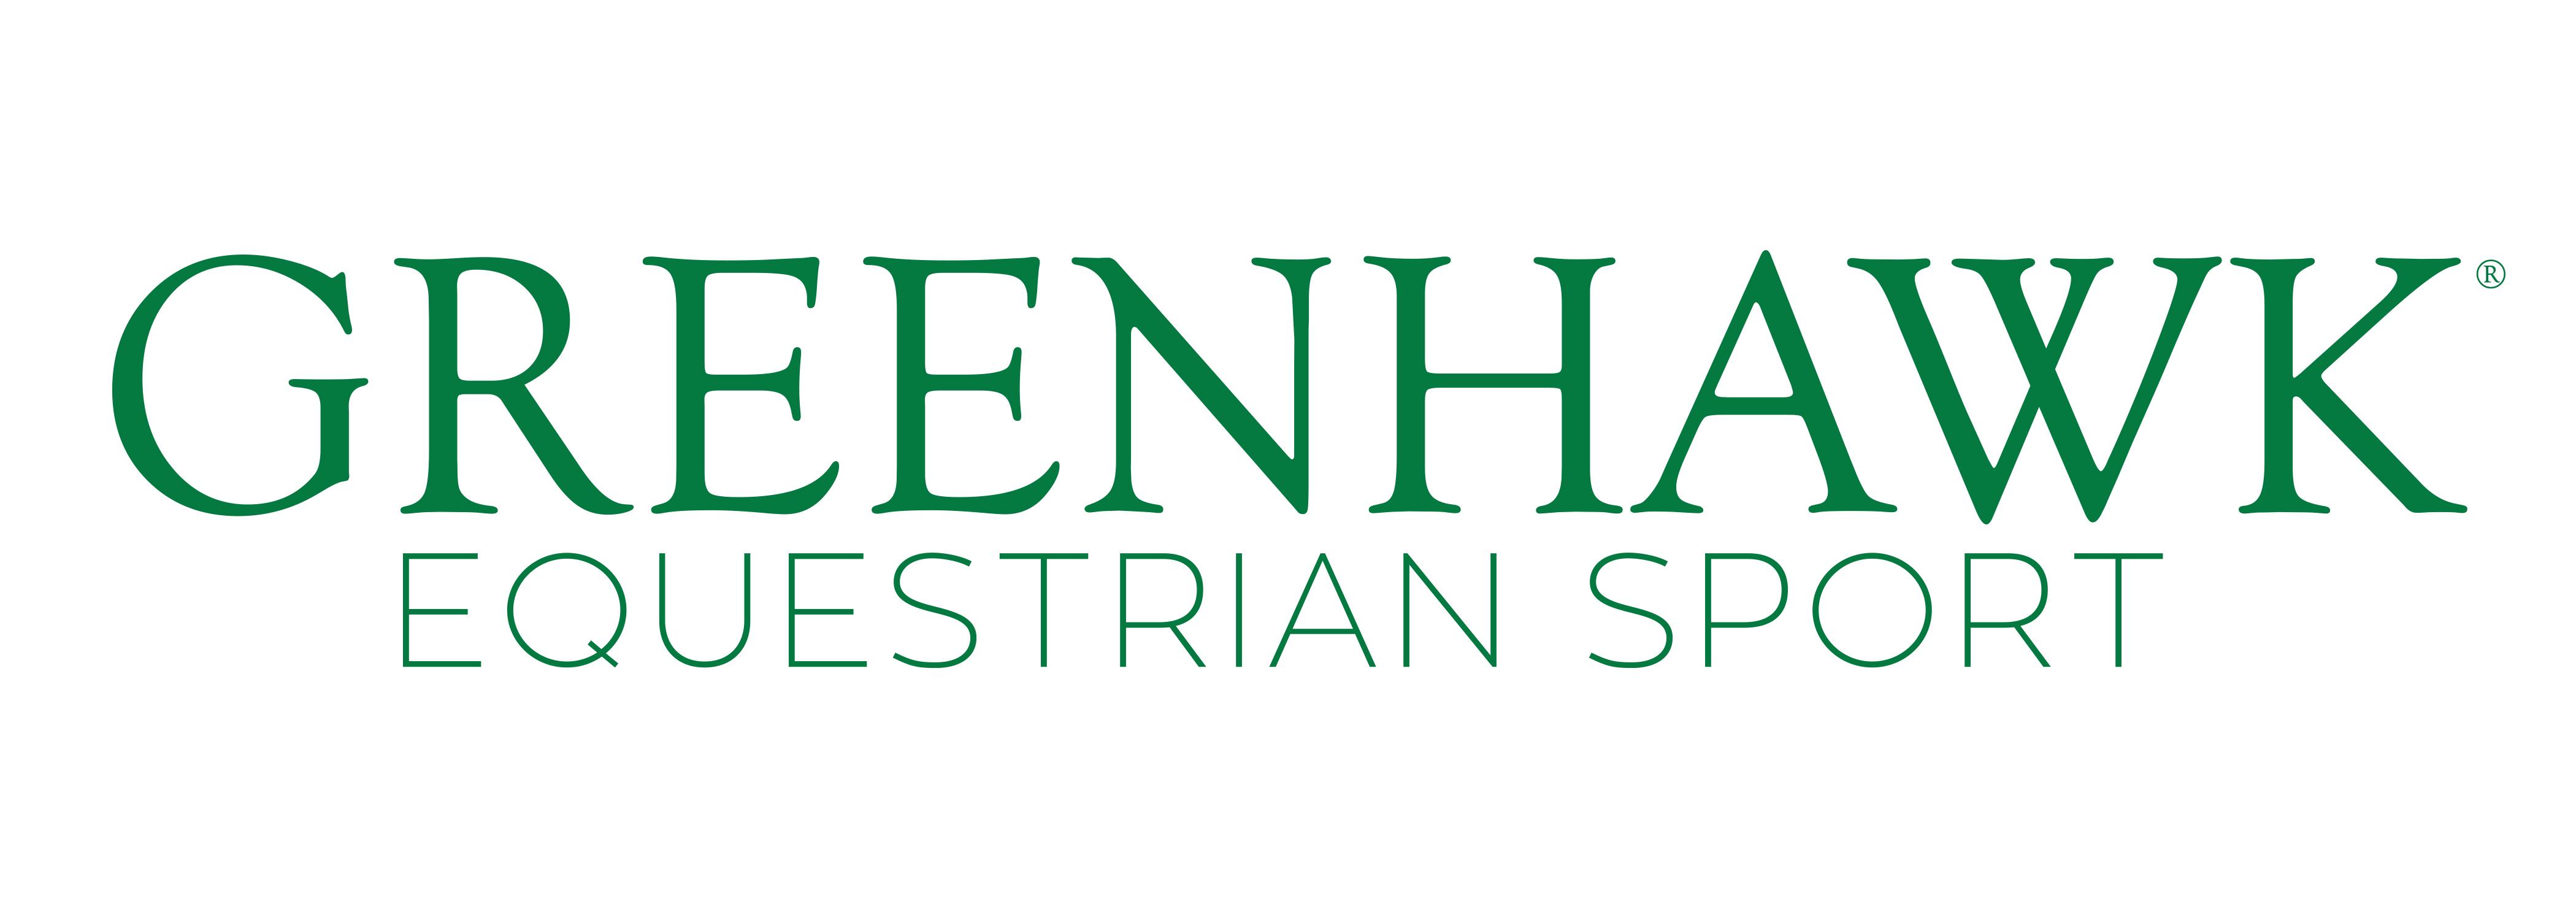 Greenhawk Equestrian